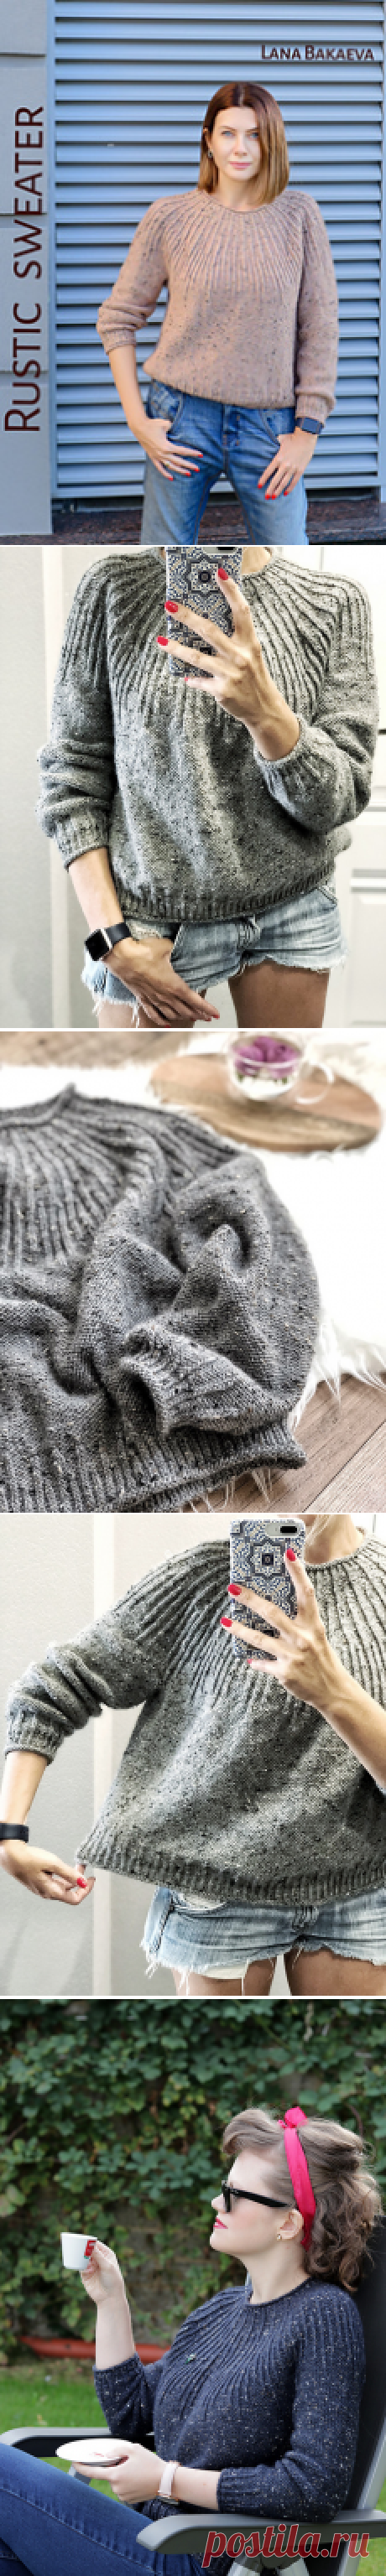 Ravelry: Rustic sweater pattern by Lana Bakaeva